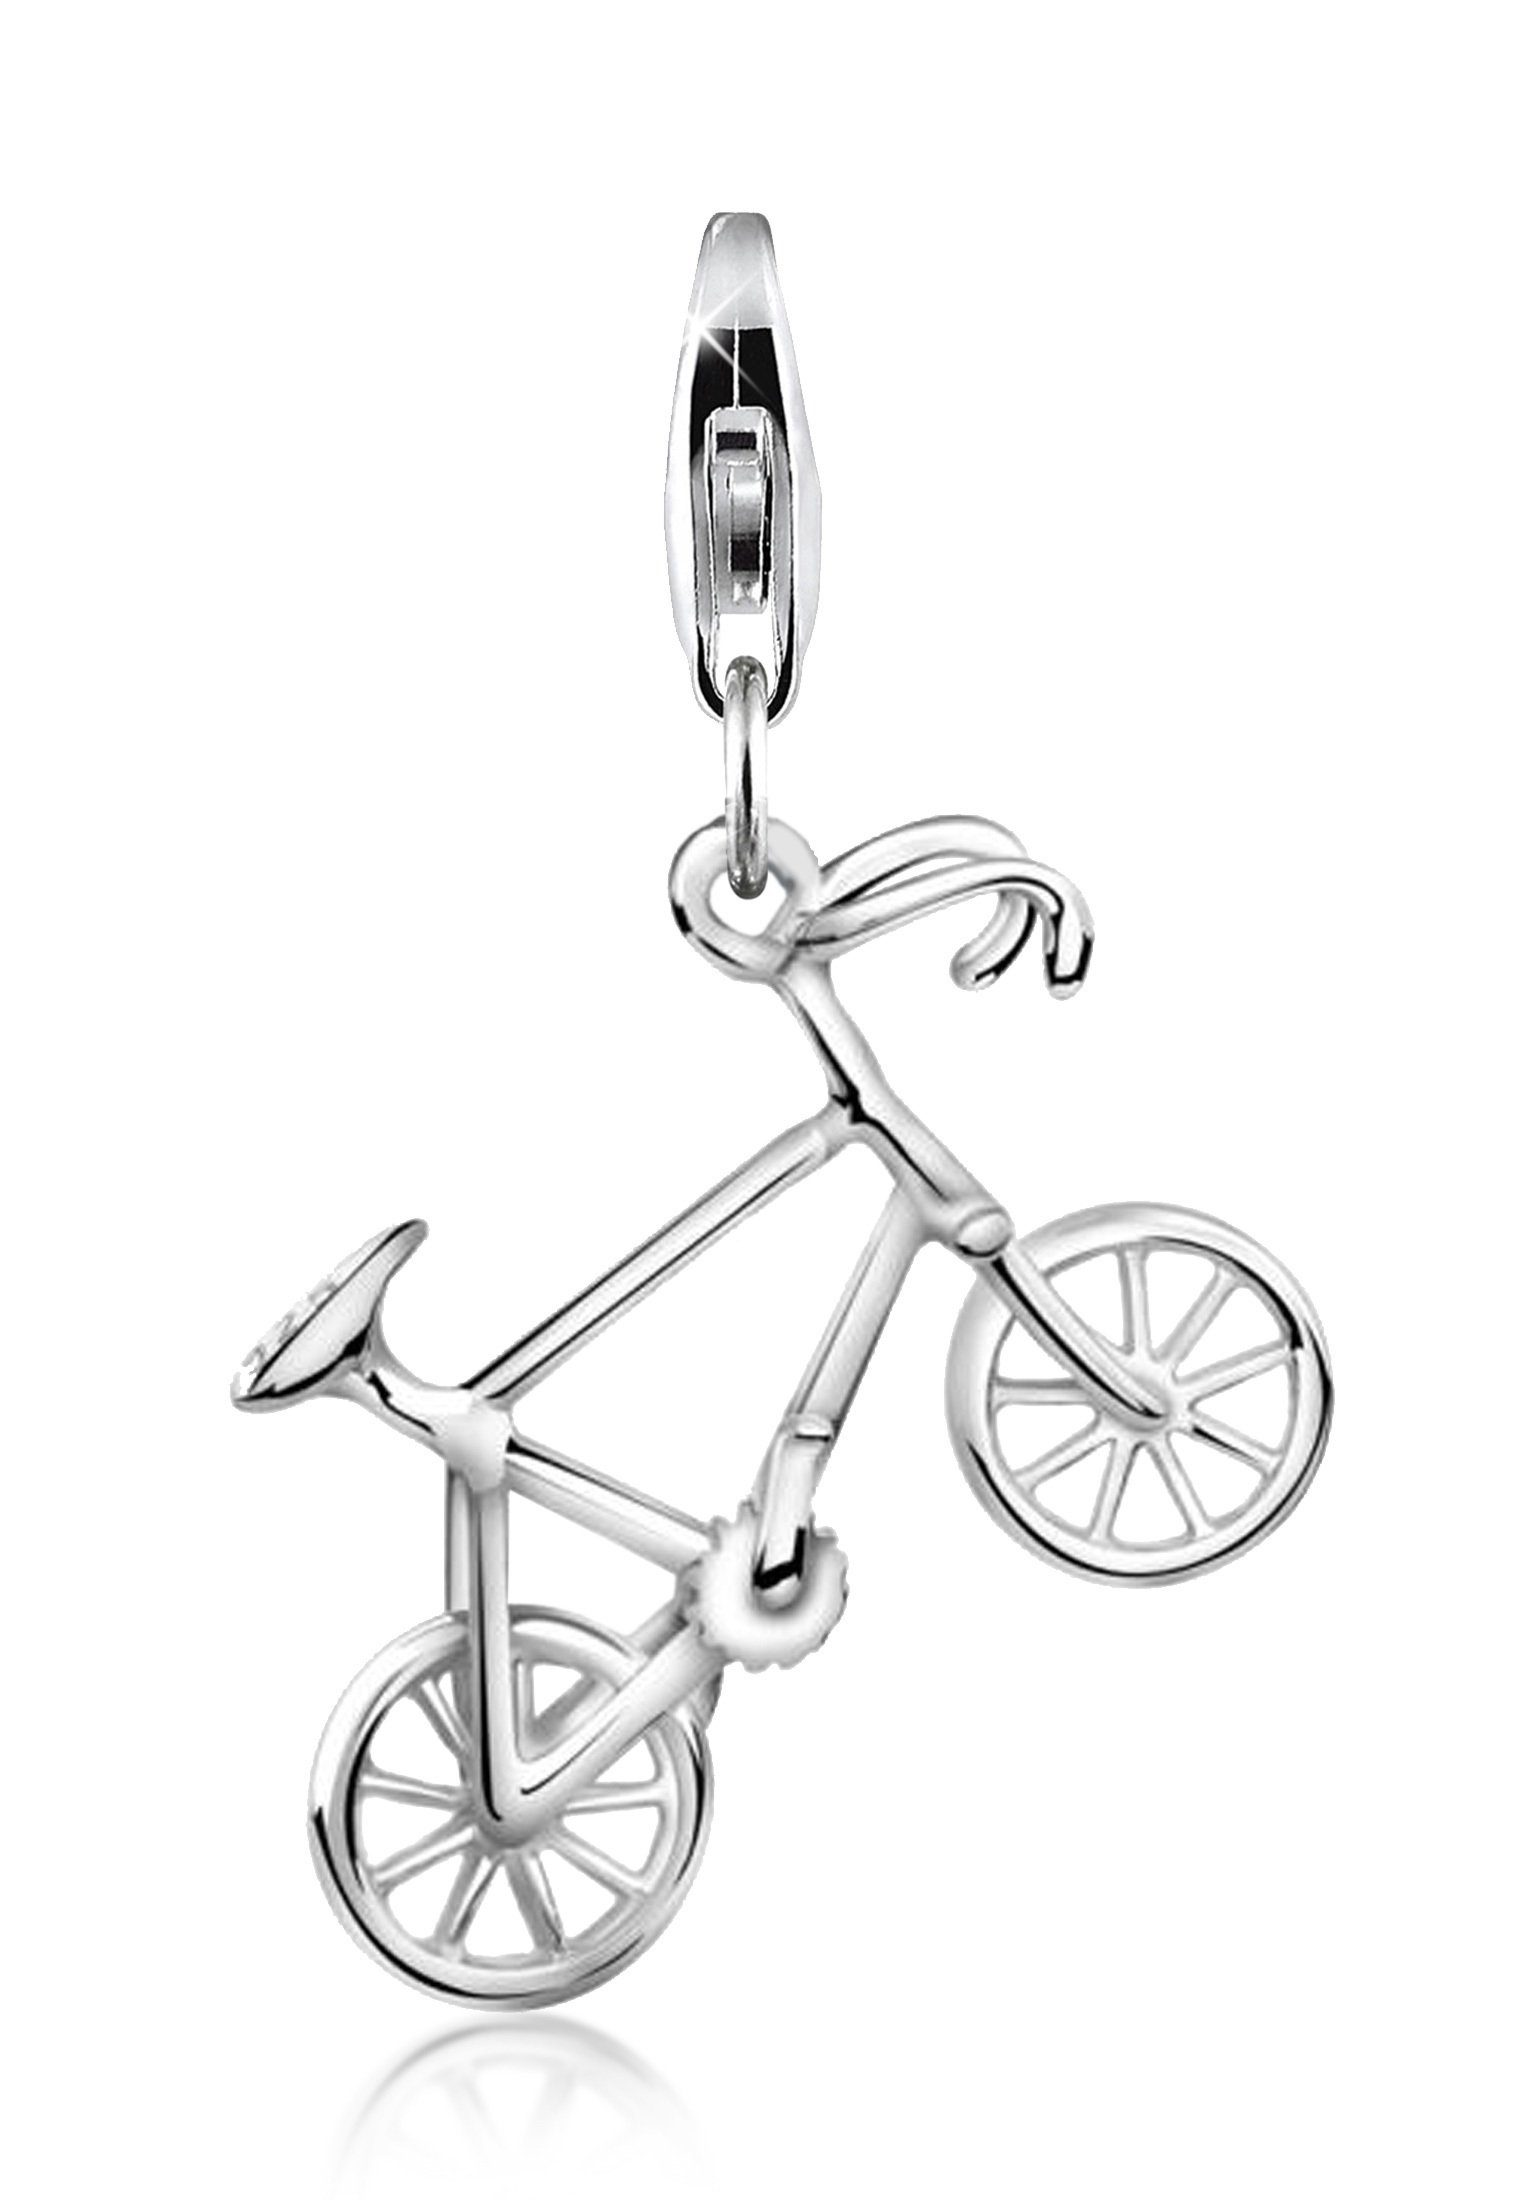 Anhänger Motorrad  mit Kette-925er Sterling Silber-Made in Germany-Neu